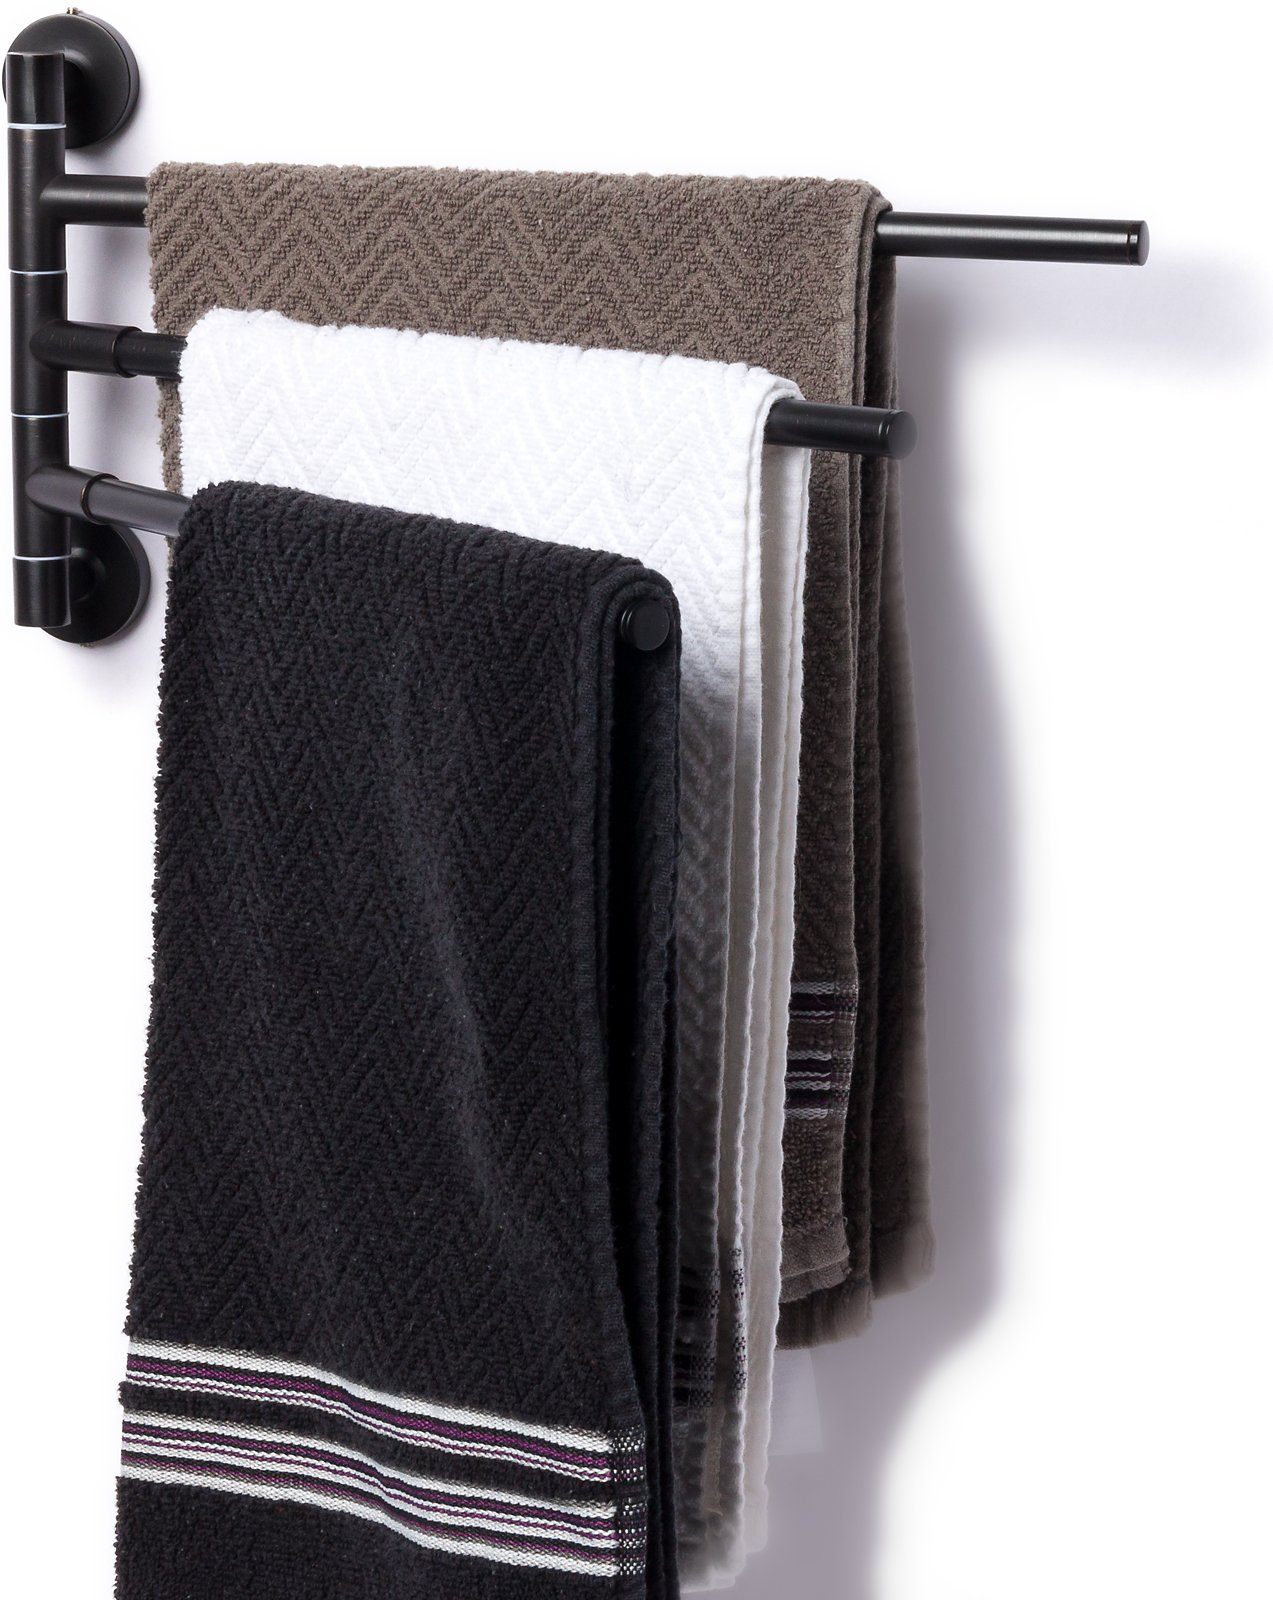 girl-with-rack-swinging-towel-trachtenberg